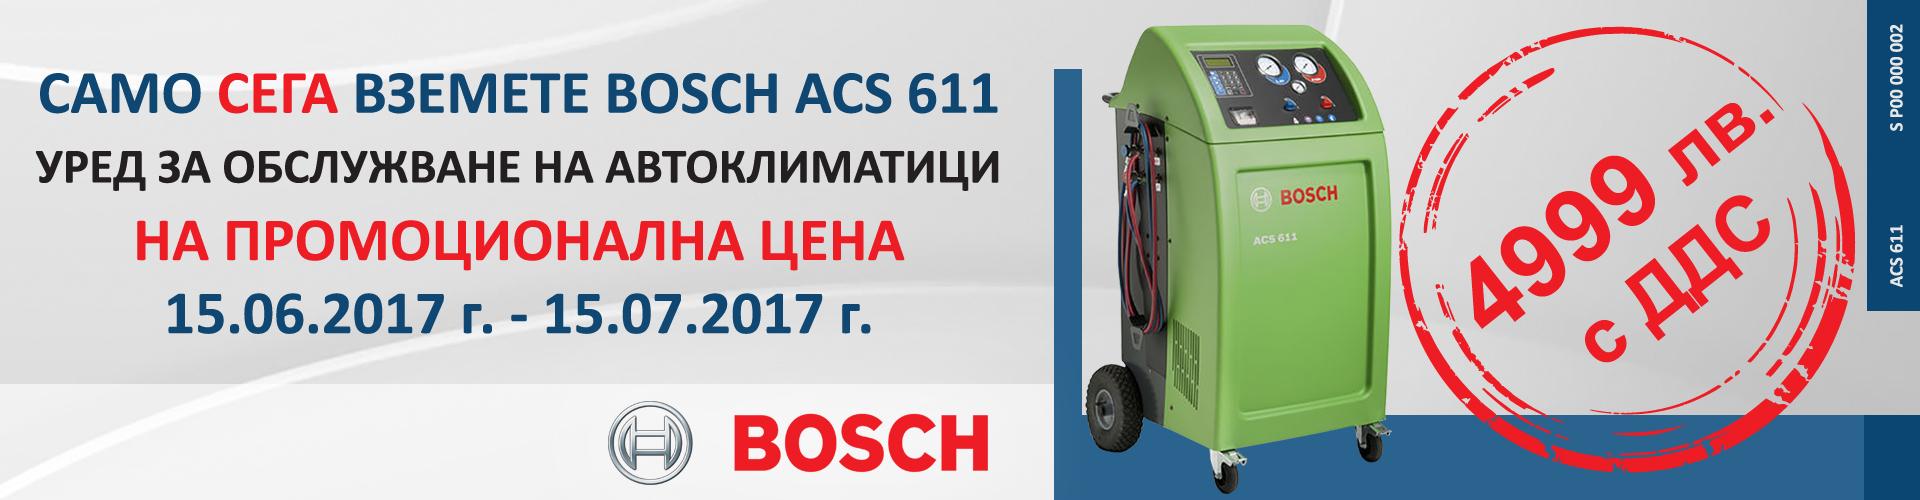 bosch_acs611.jpg